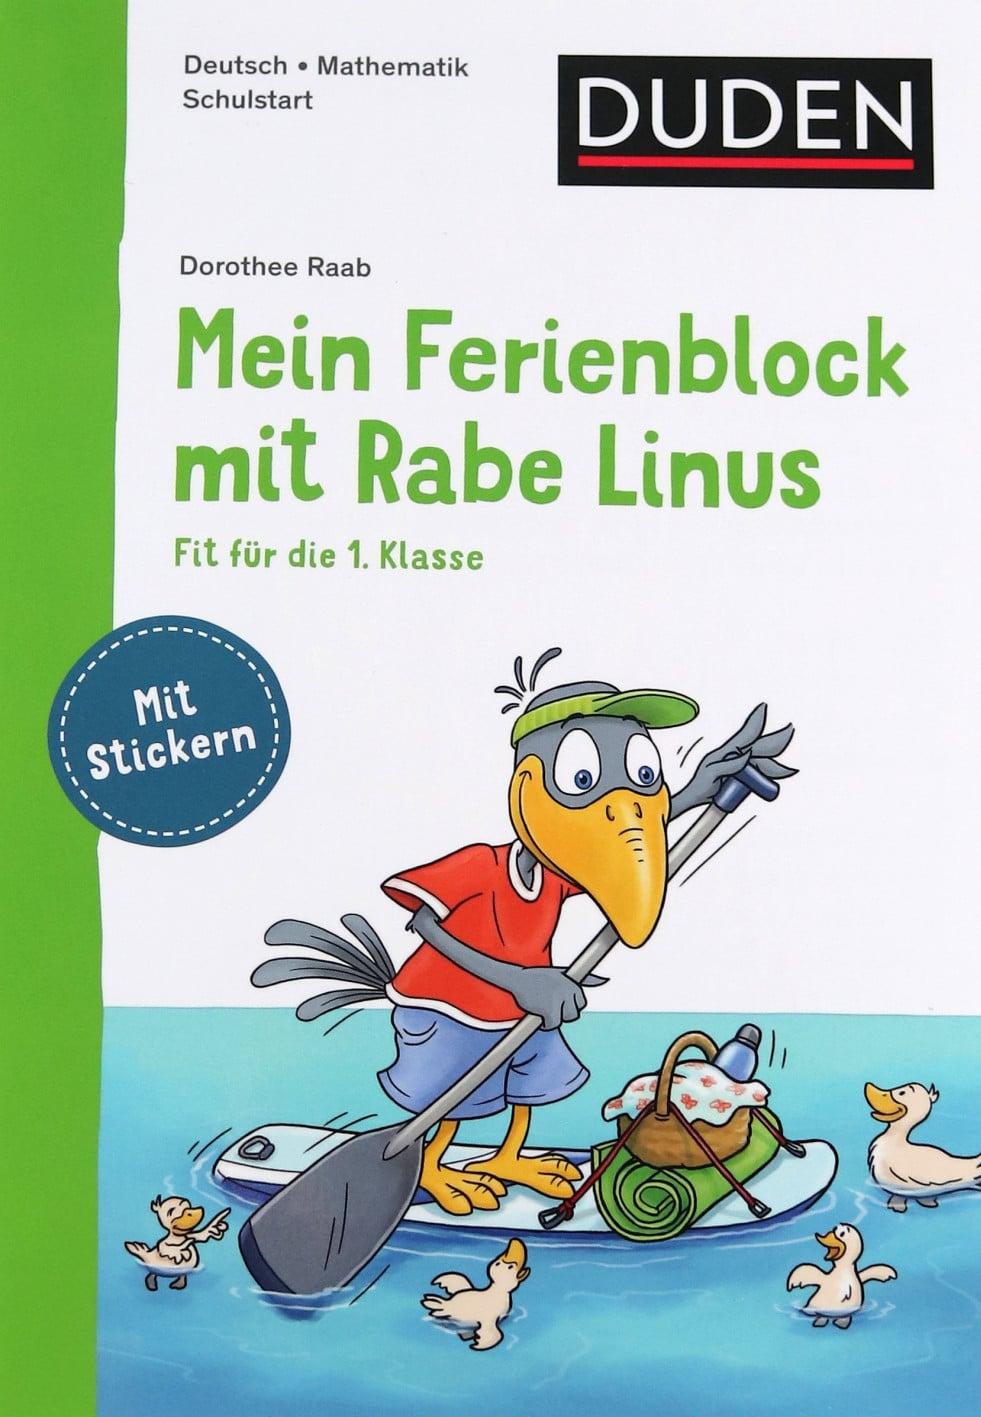 DUDEN_Rabe_Linus_Block